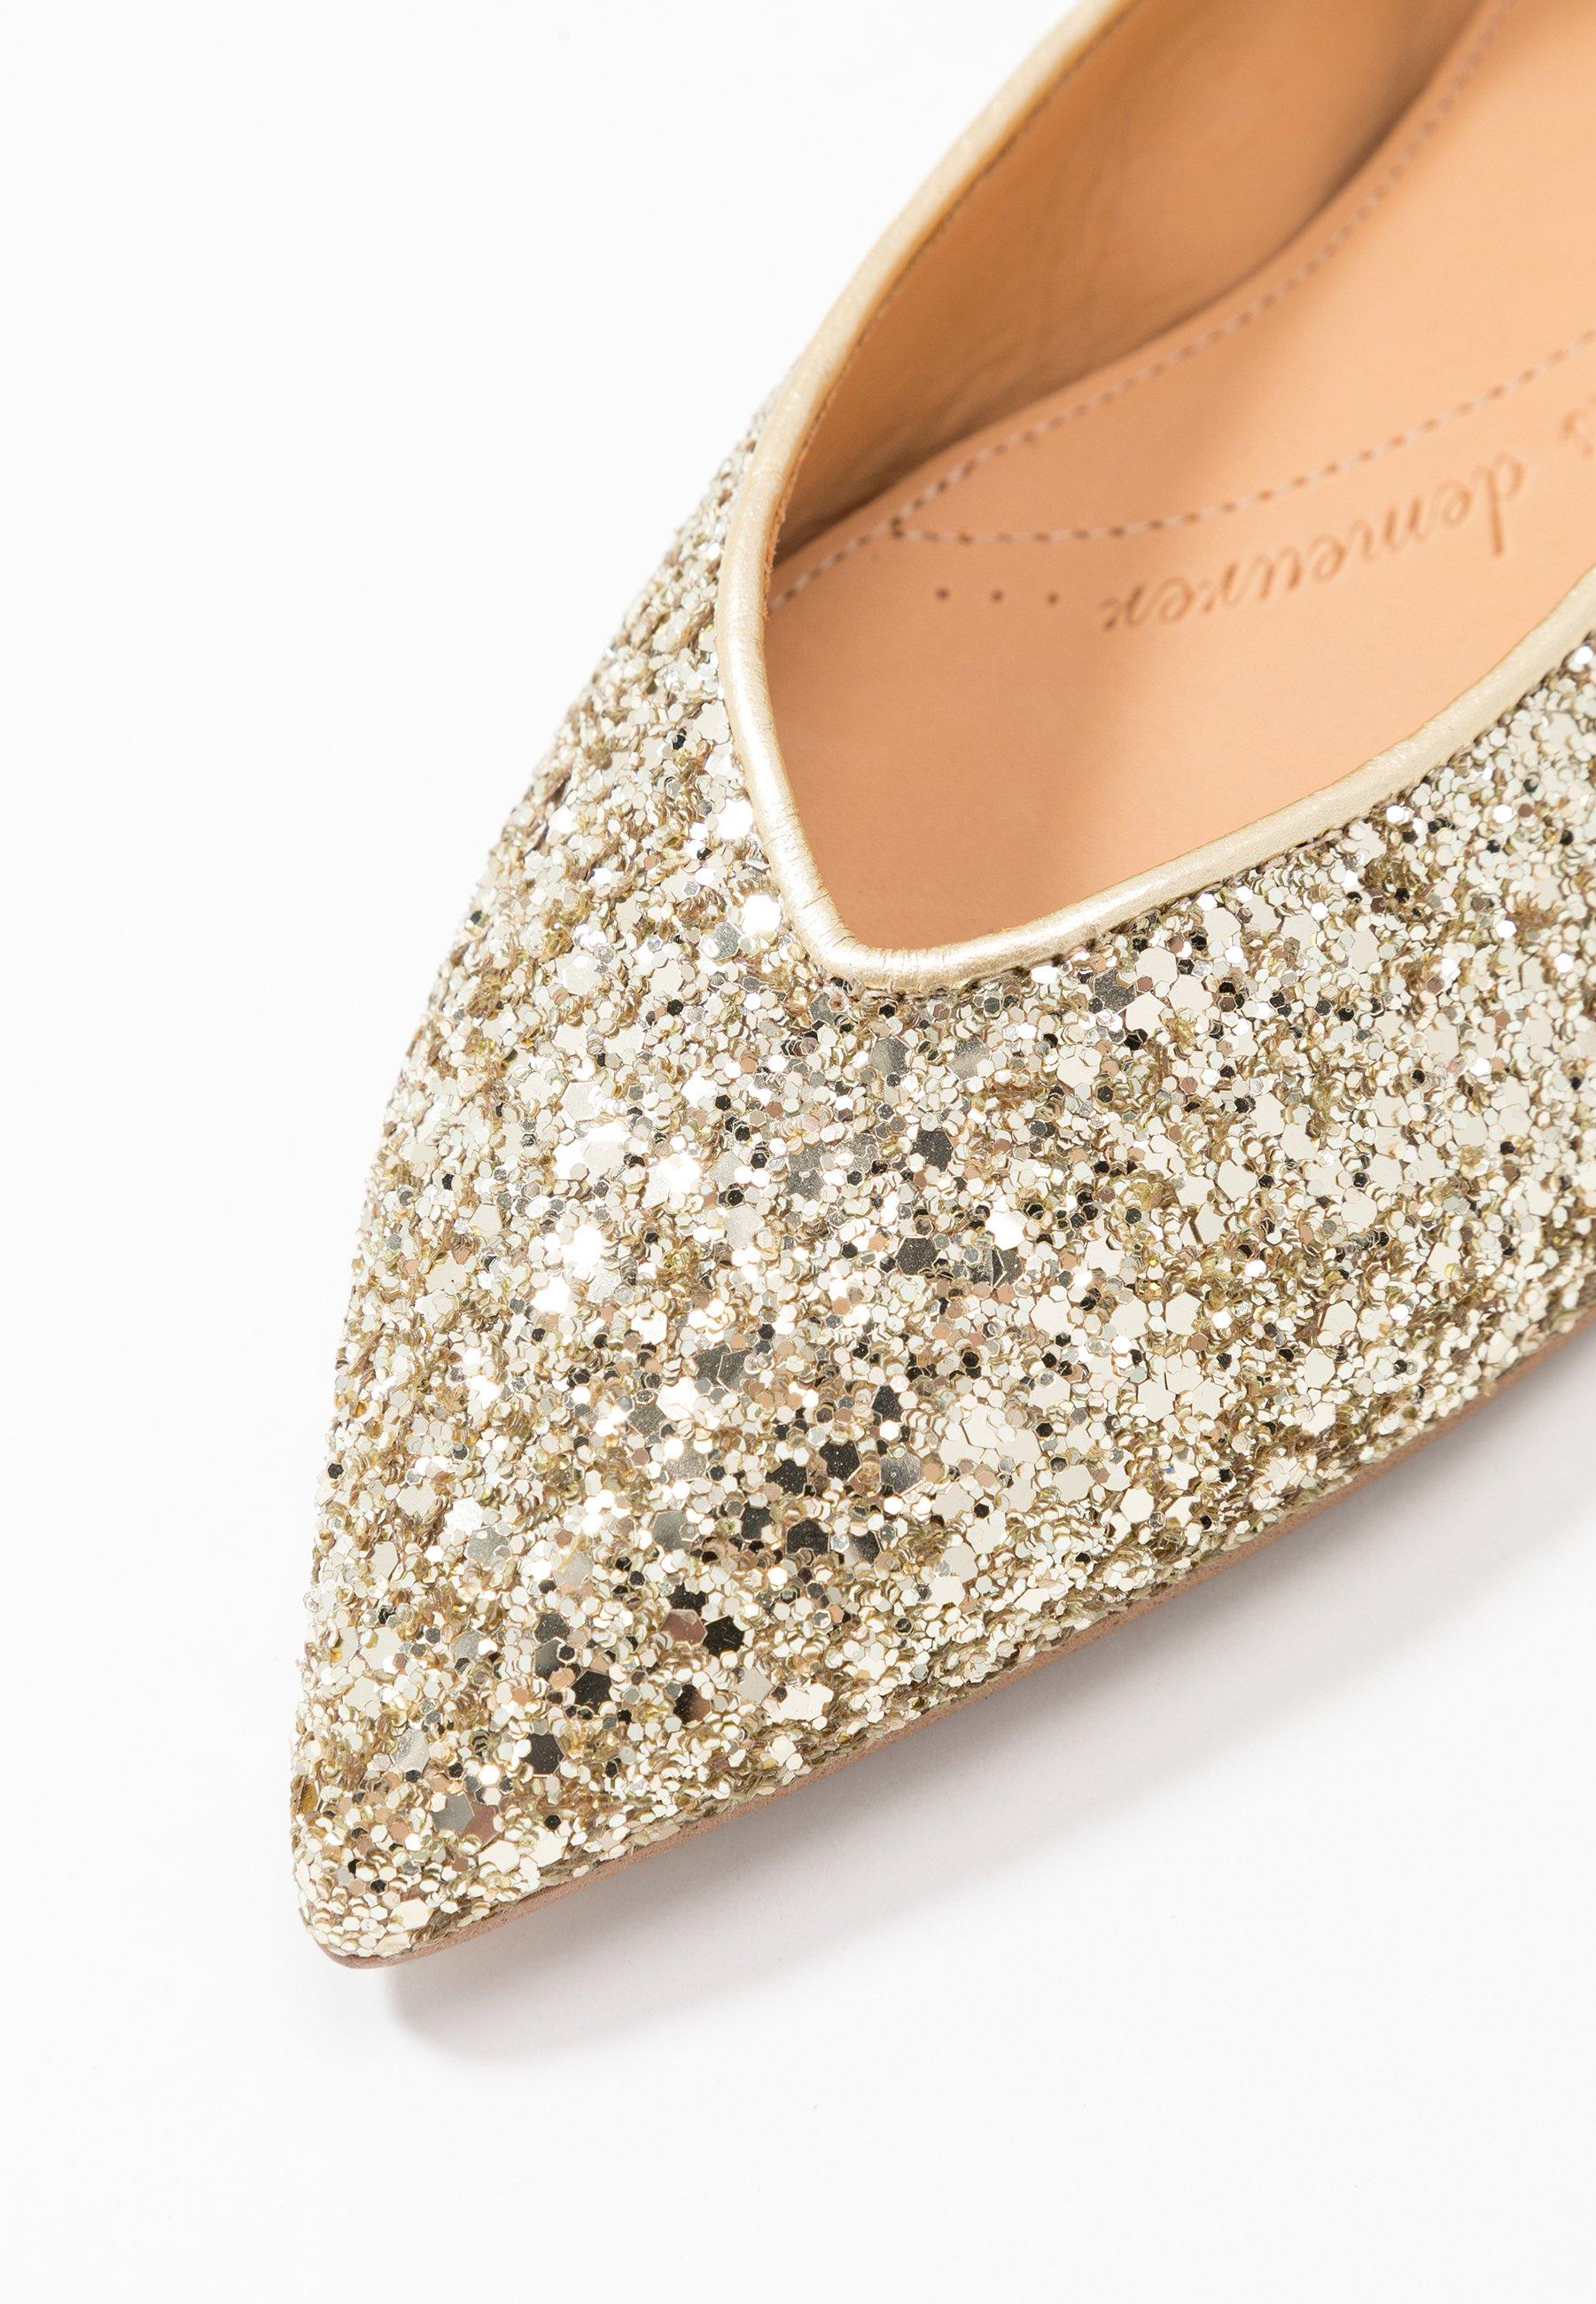 Chatelles AMÉDÉE - Klassischer  Ballerina - light gold glitter - Black Friday